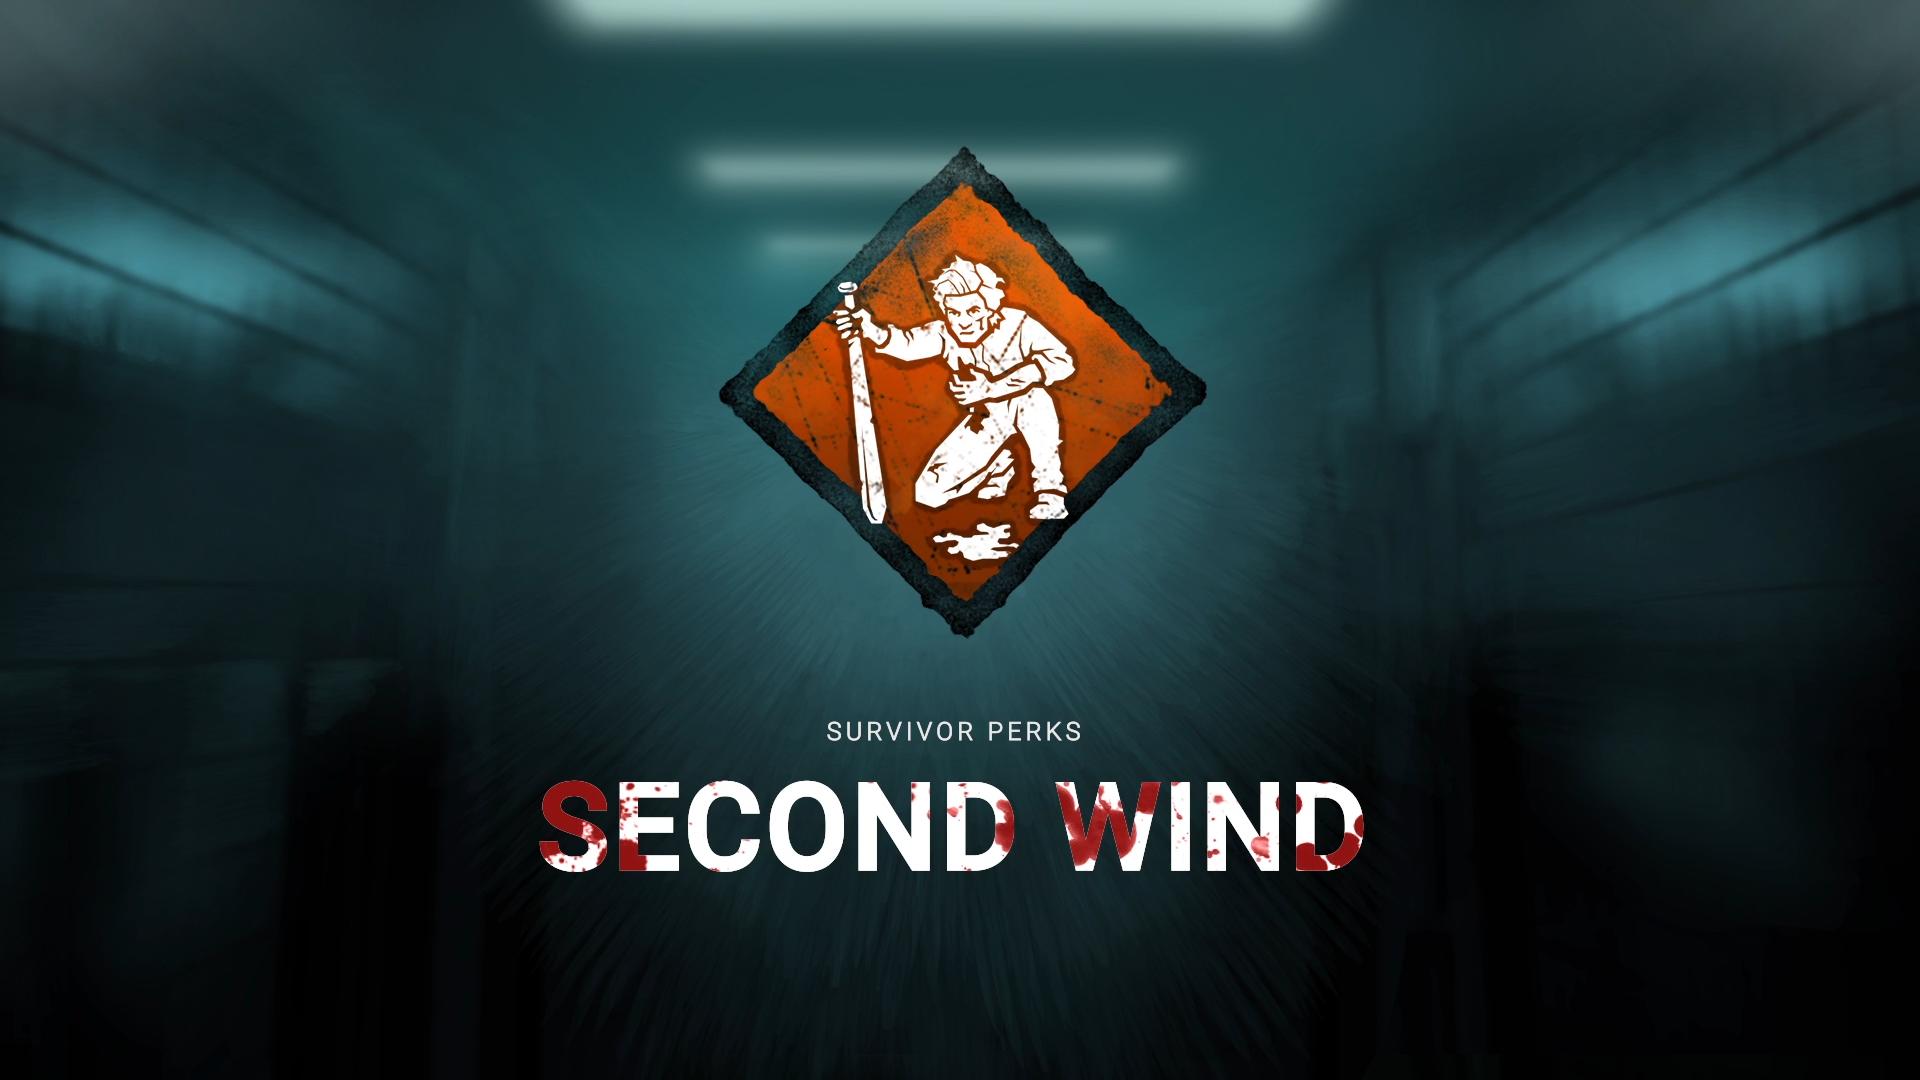 secondwind.PNG